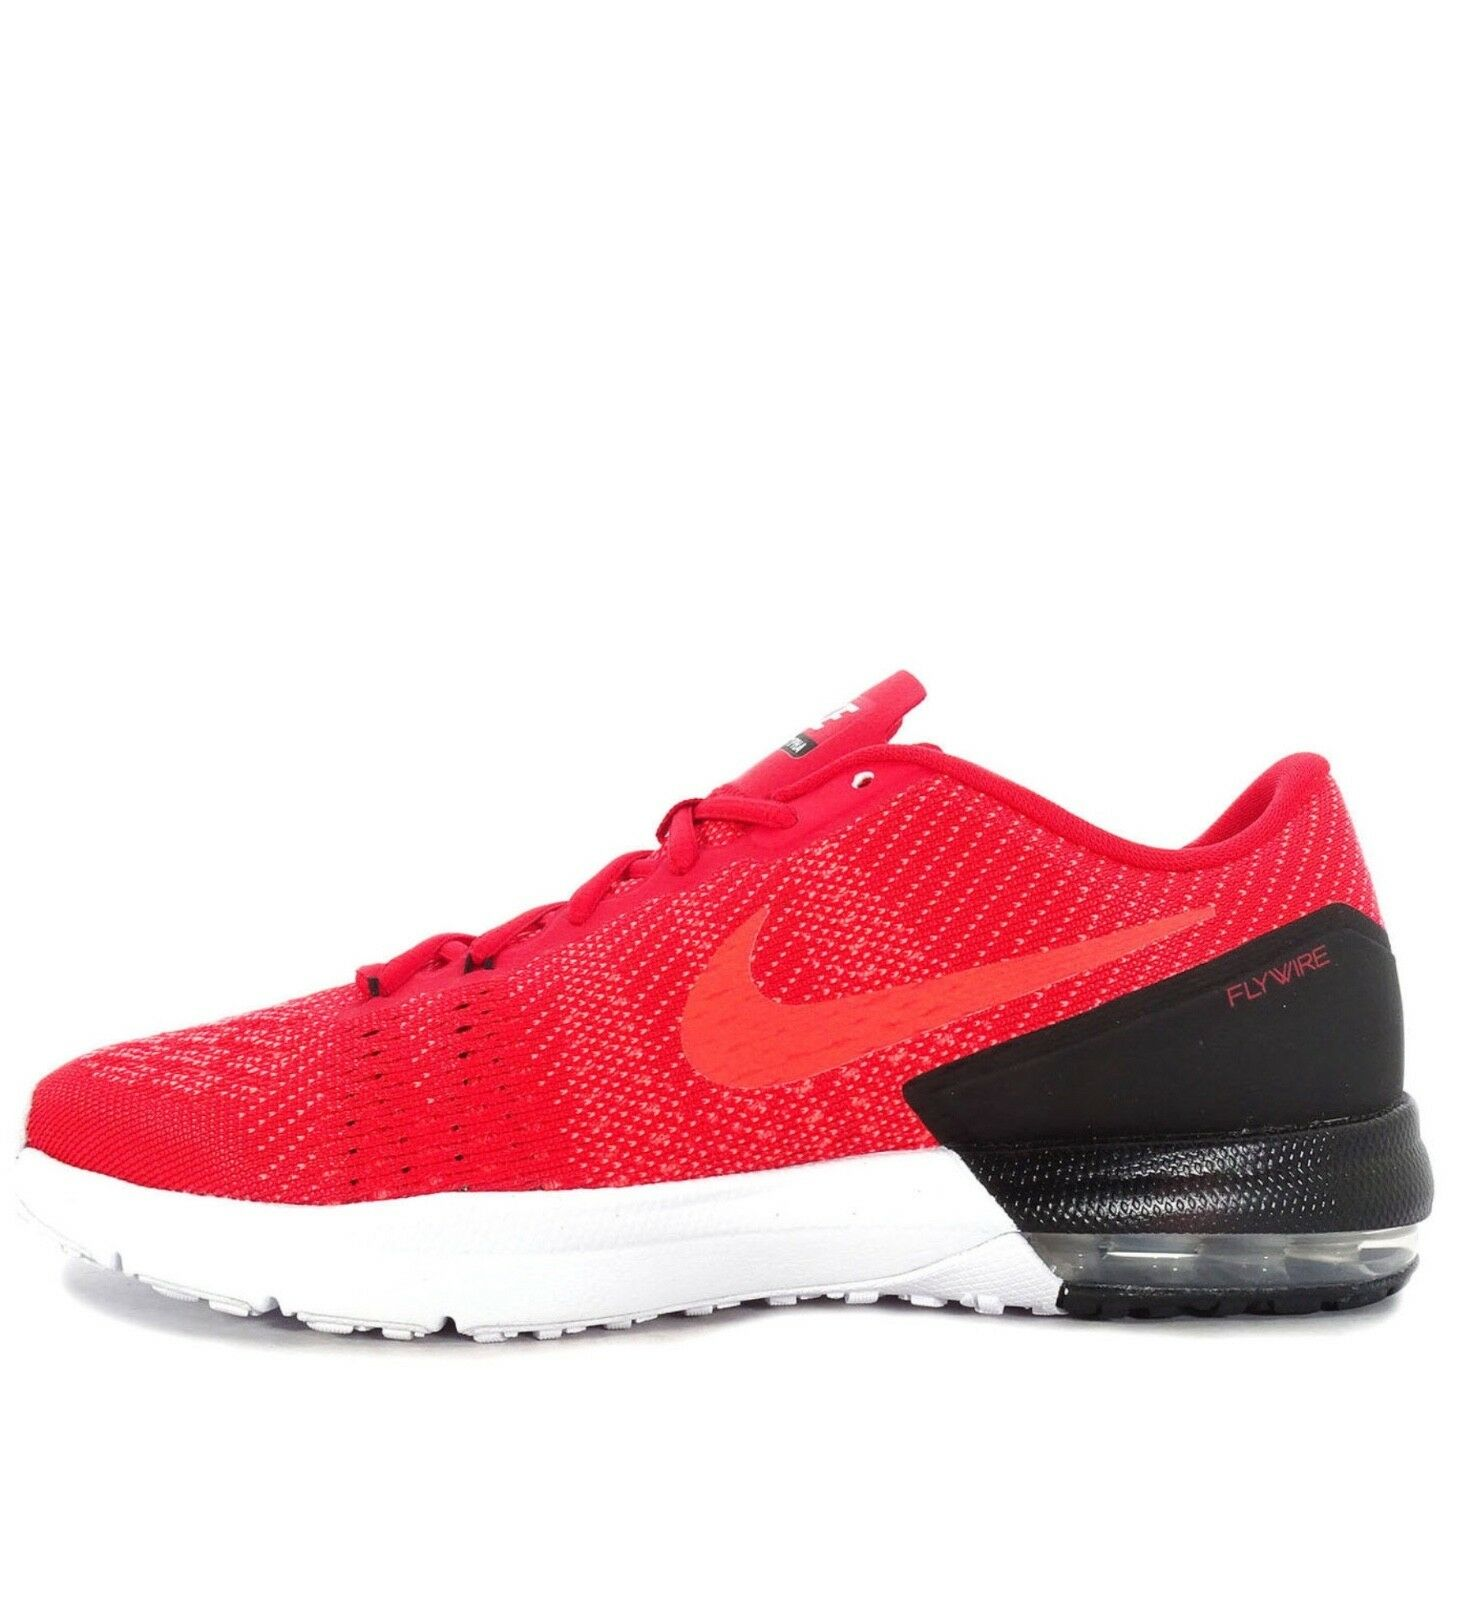 BNWB Max Nike Para Hombre Air Max BNWB Tifa Rojo Negro Blanco Zapatos  de entrenamiento 820198616 Reino Unido 8 10 62738e